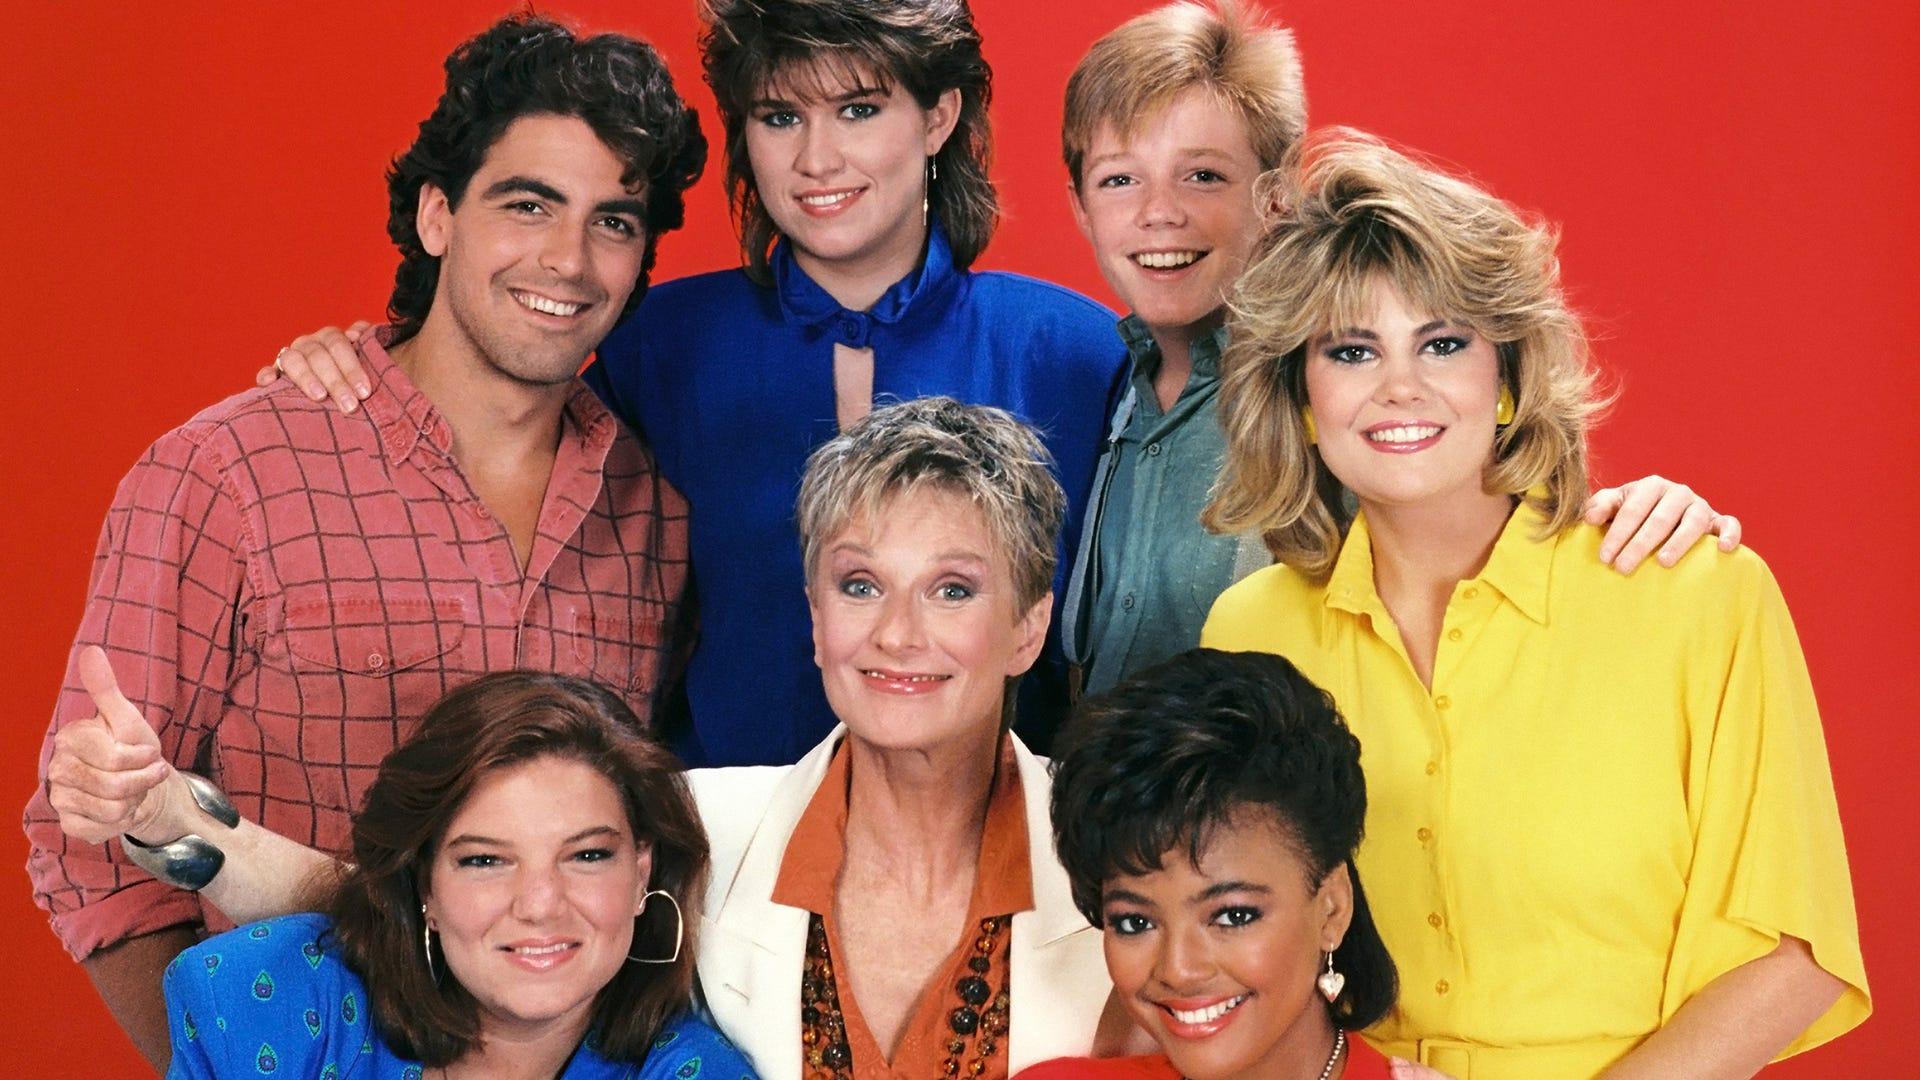 180803-factsoflife.George Clooney, Nancy McKeon, Mackenzie Astin, Lisa Whelchel, Kim Fields, Mindy Cohn, Cloris Leachman; The Facts of Life